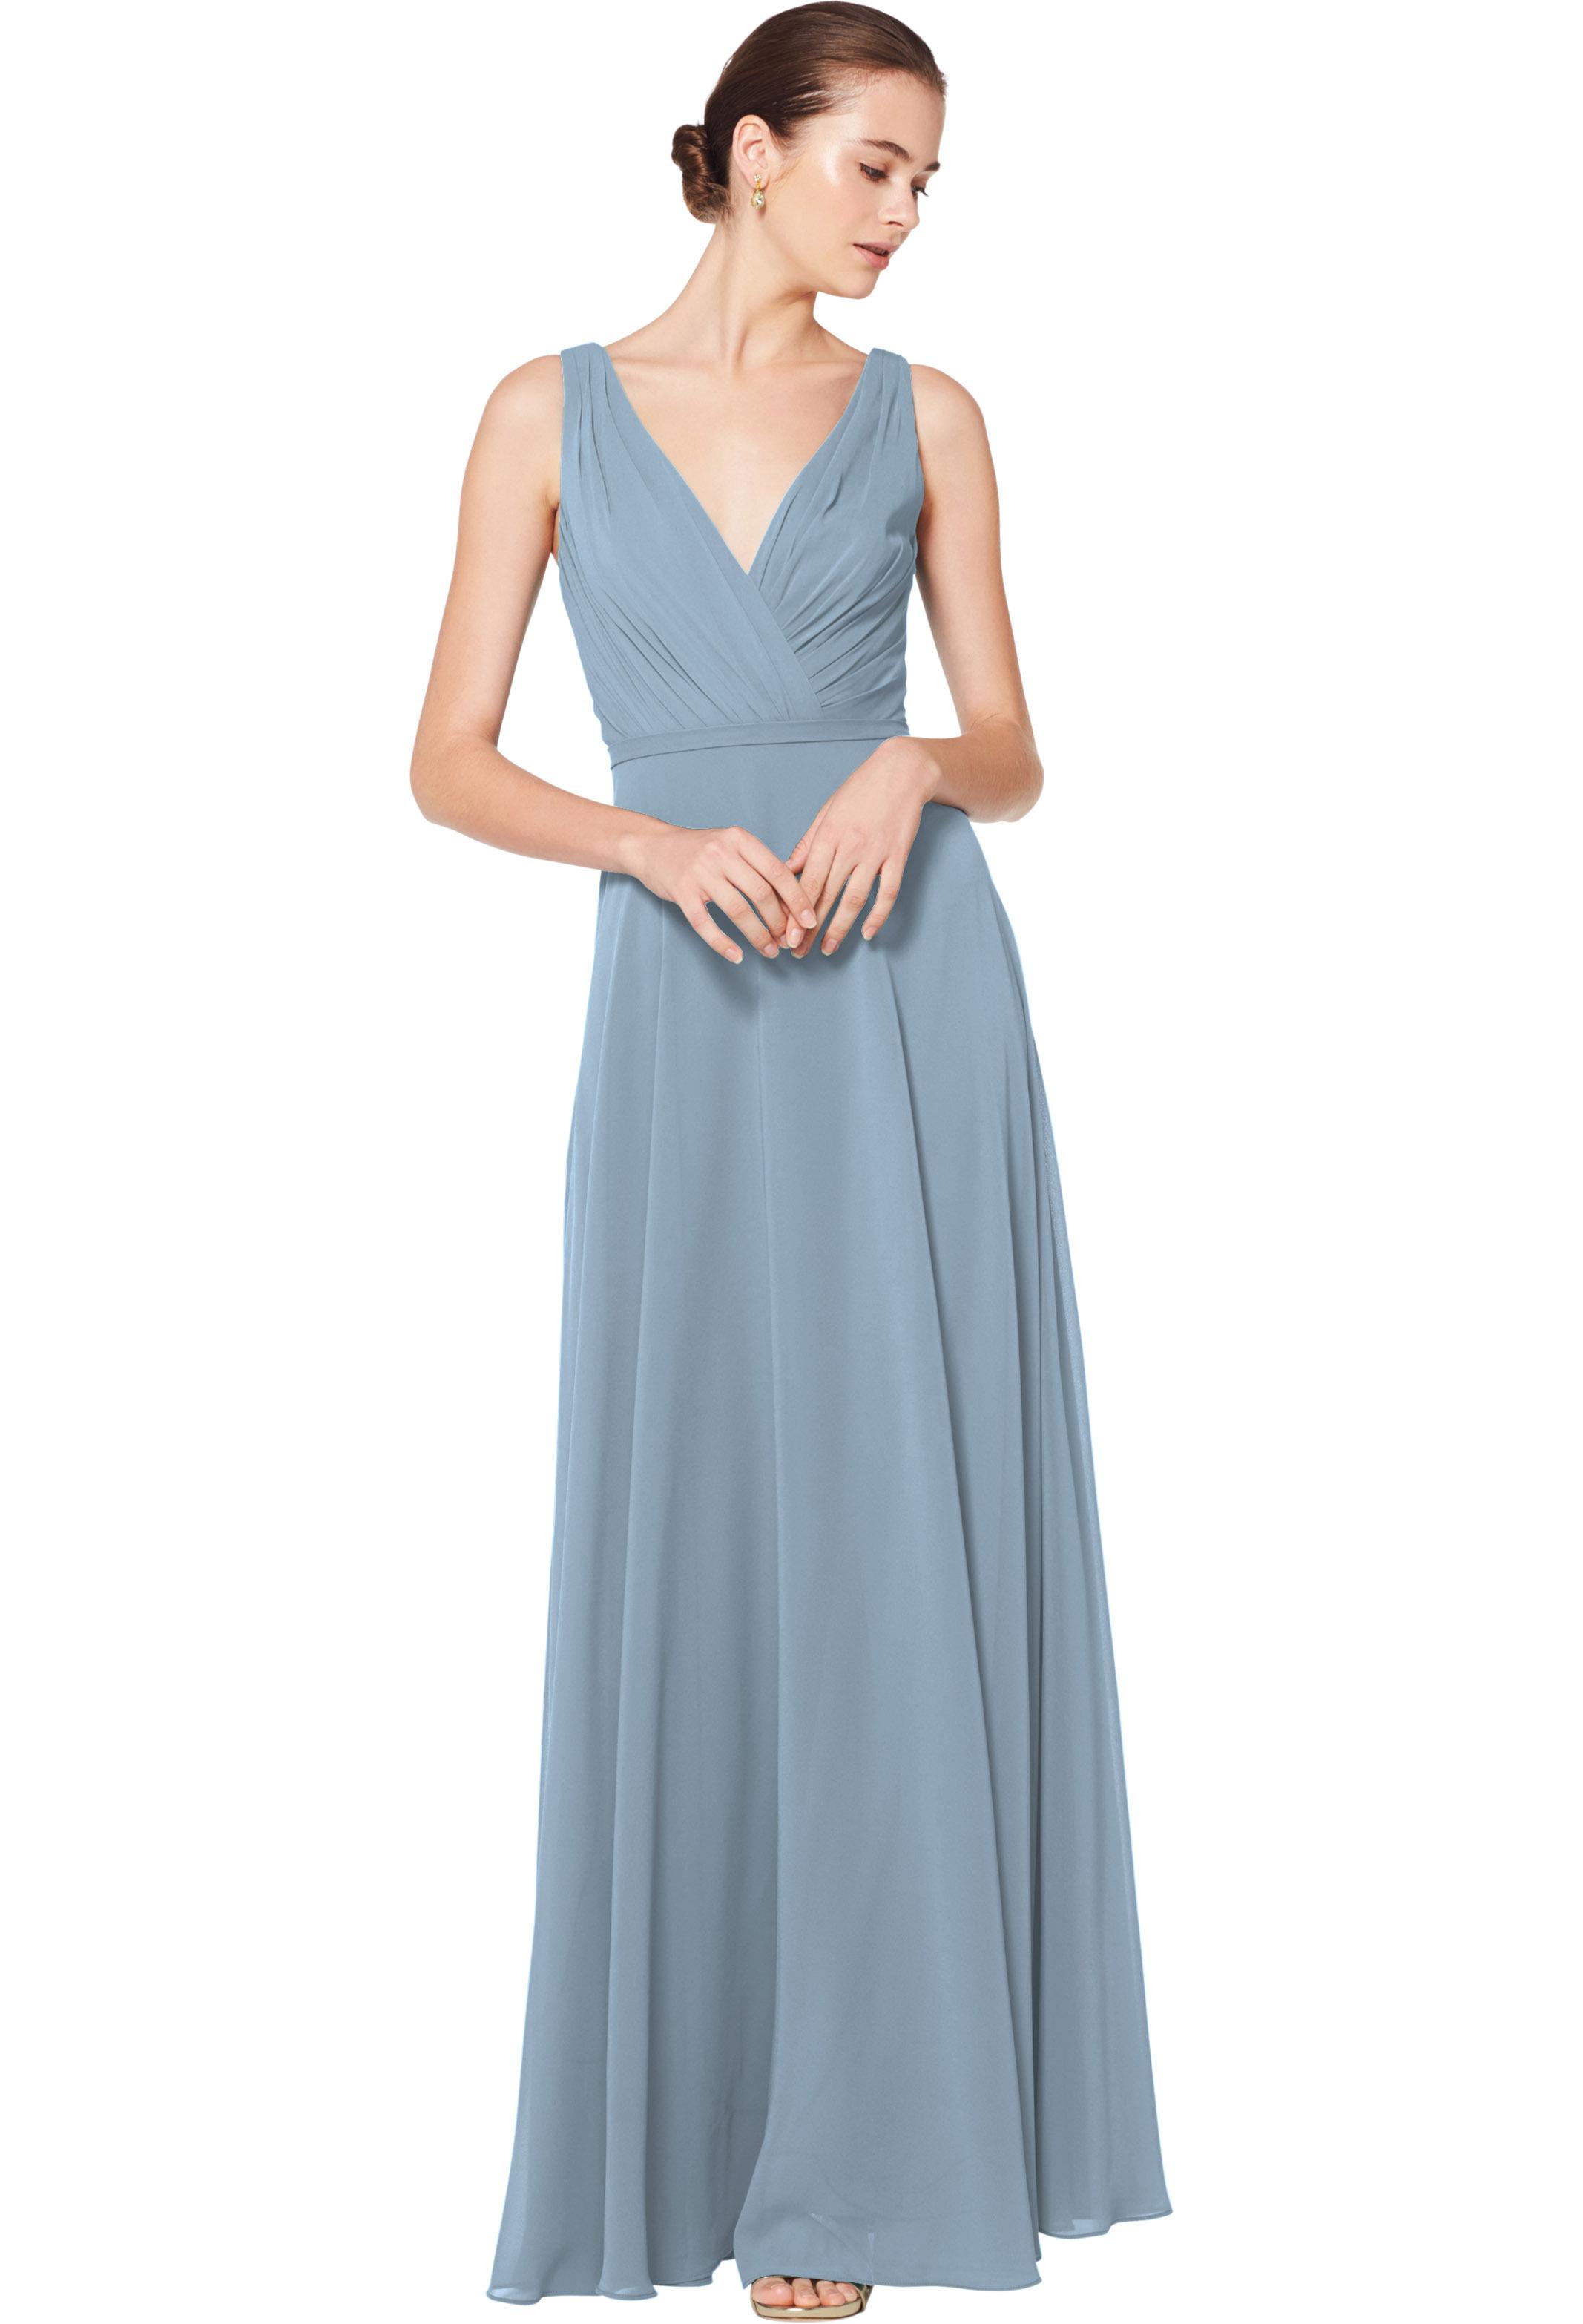 Bill Levkoff SLATE Chiffon Sleeveless A-line gown, $180.00 Front